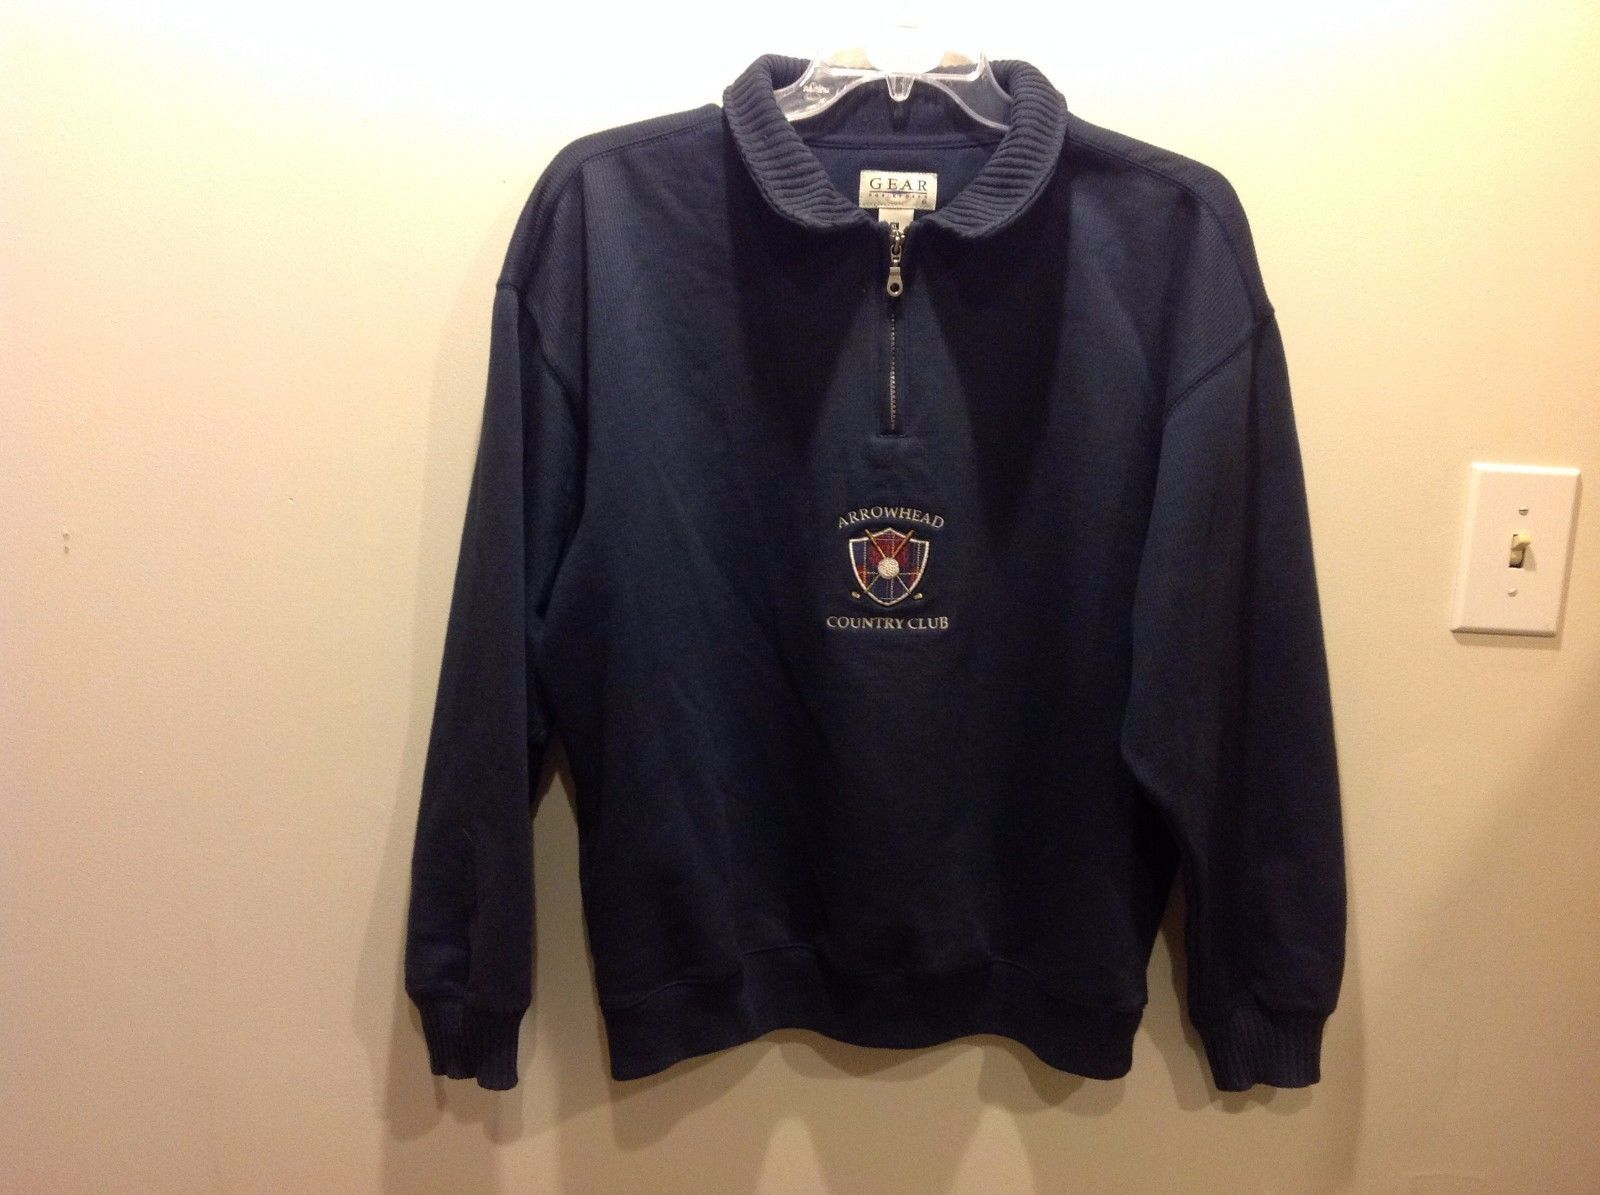 Navy Blue Arrowhead Country Club Golfing Collared Sweater Sz XL